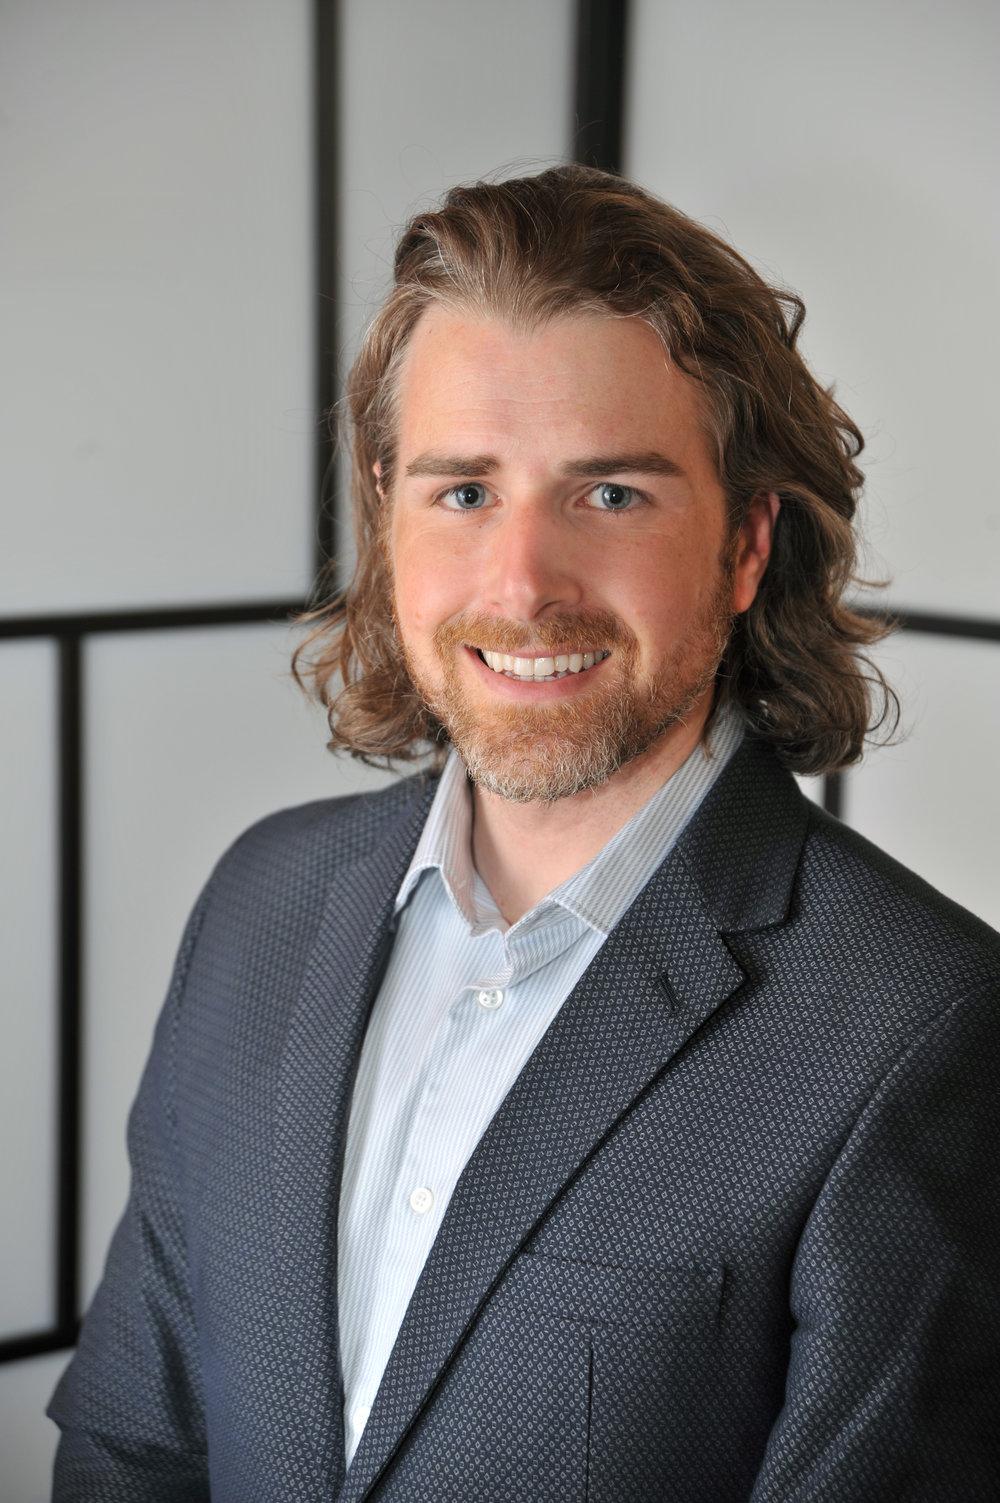 Joel Metlen